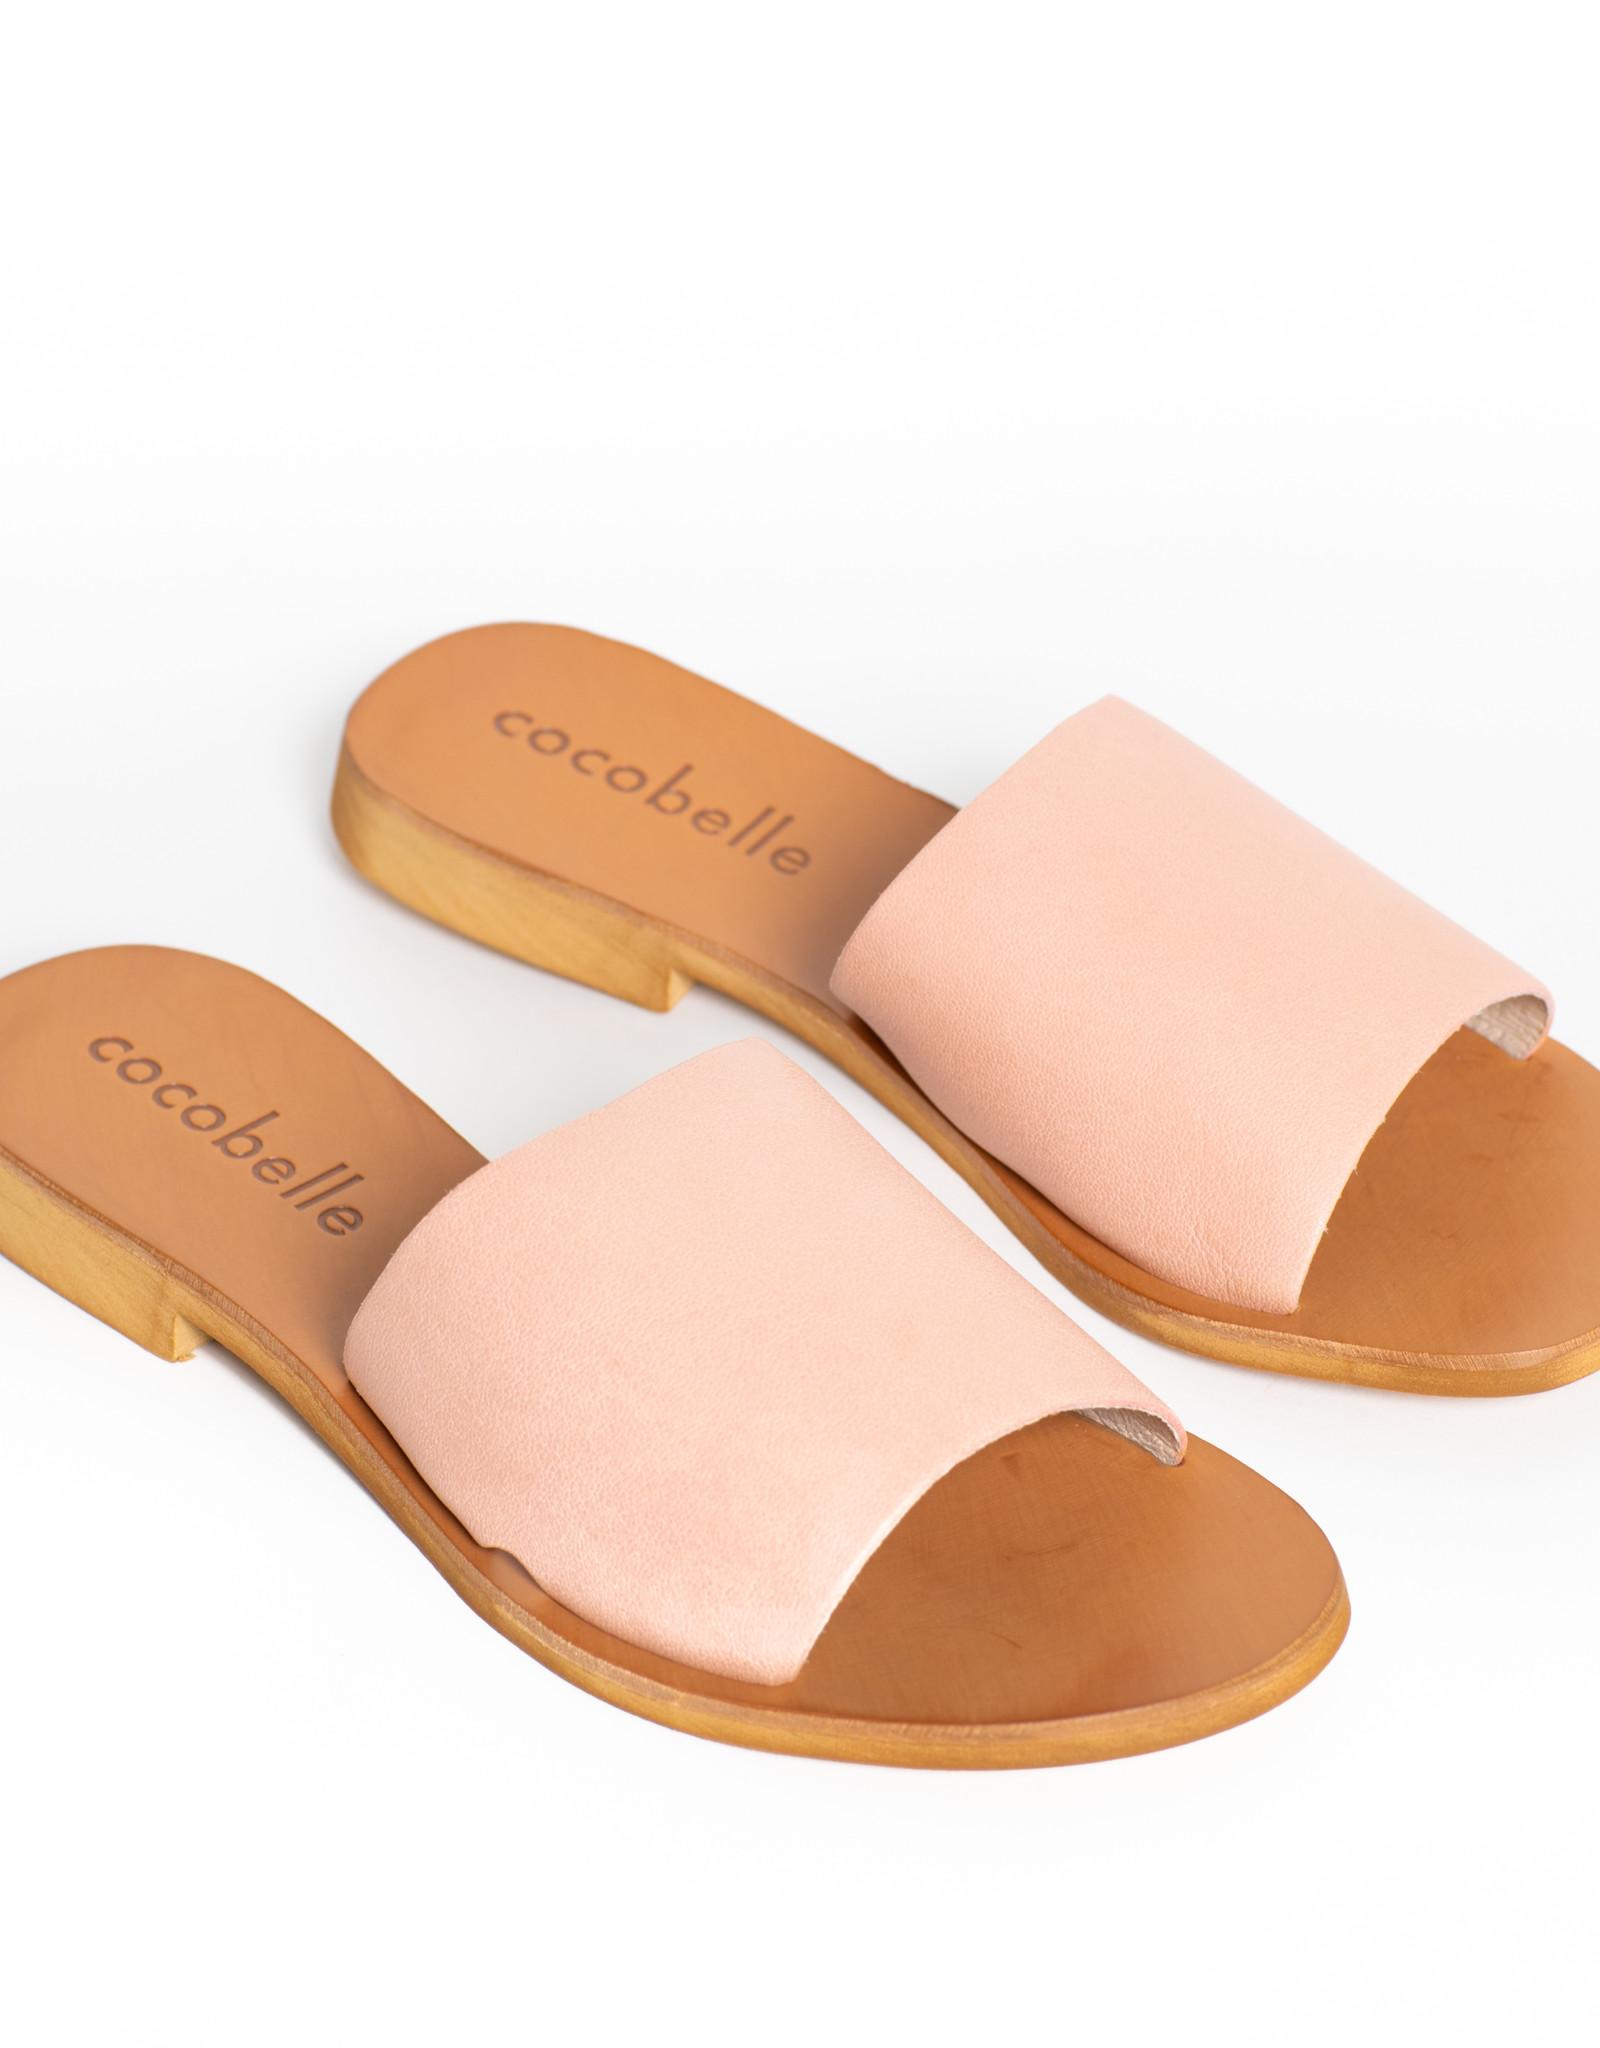 Cocobelle Rose Bhea Slide Sandal